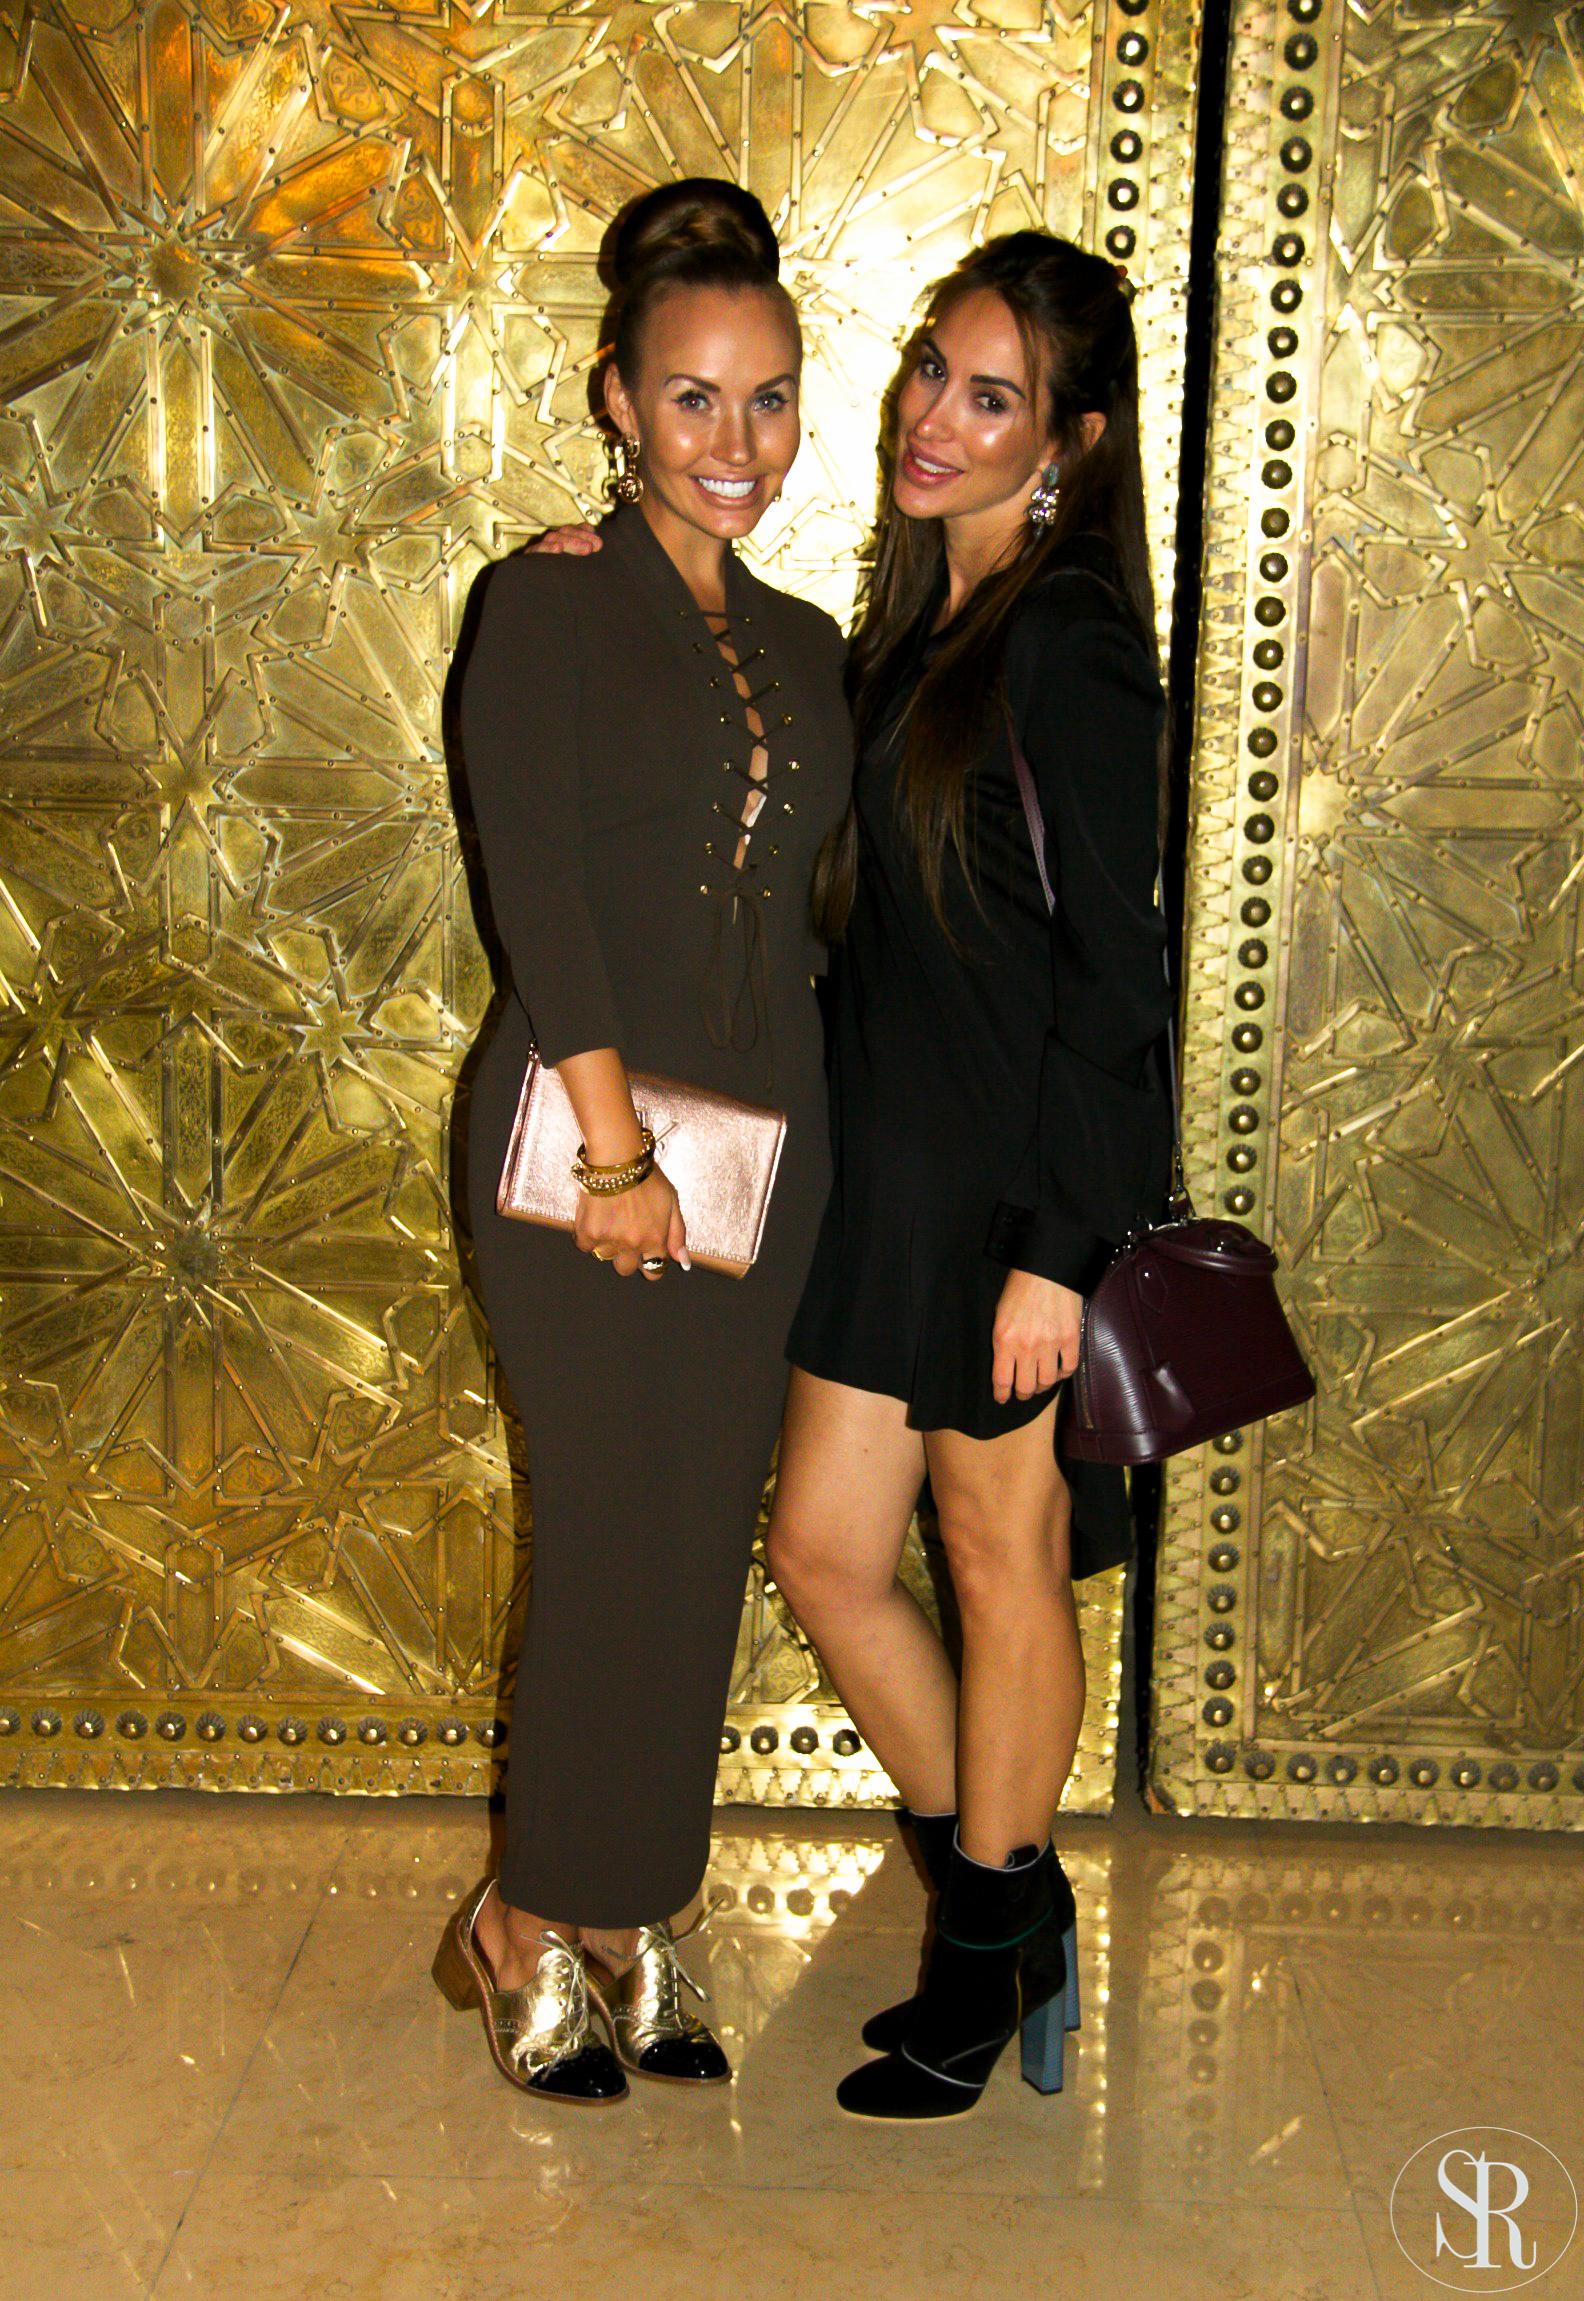 VIP launch of MANOLO BLAHNIK collection Fashion Afternoon Tea by Raffles Dubai-4065.jpg